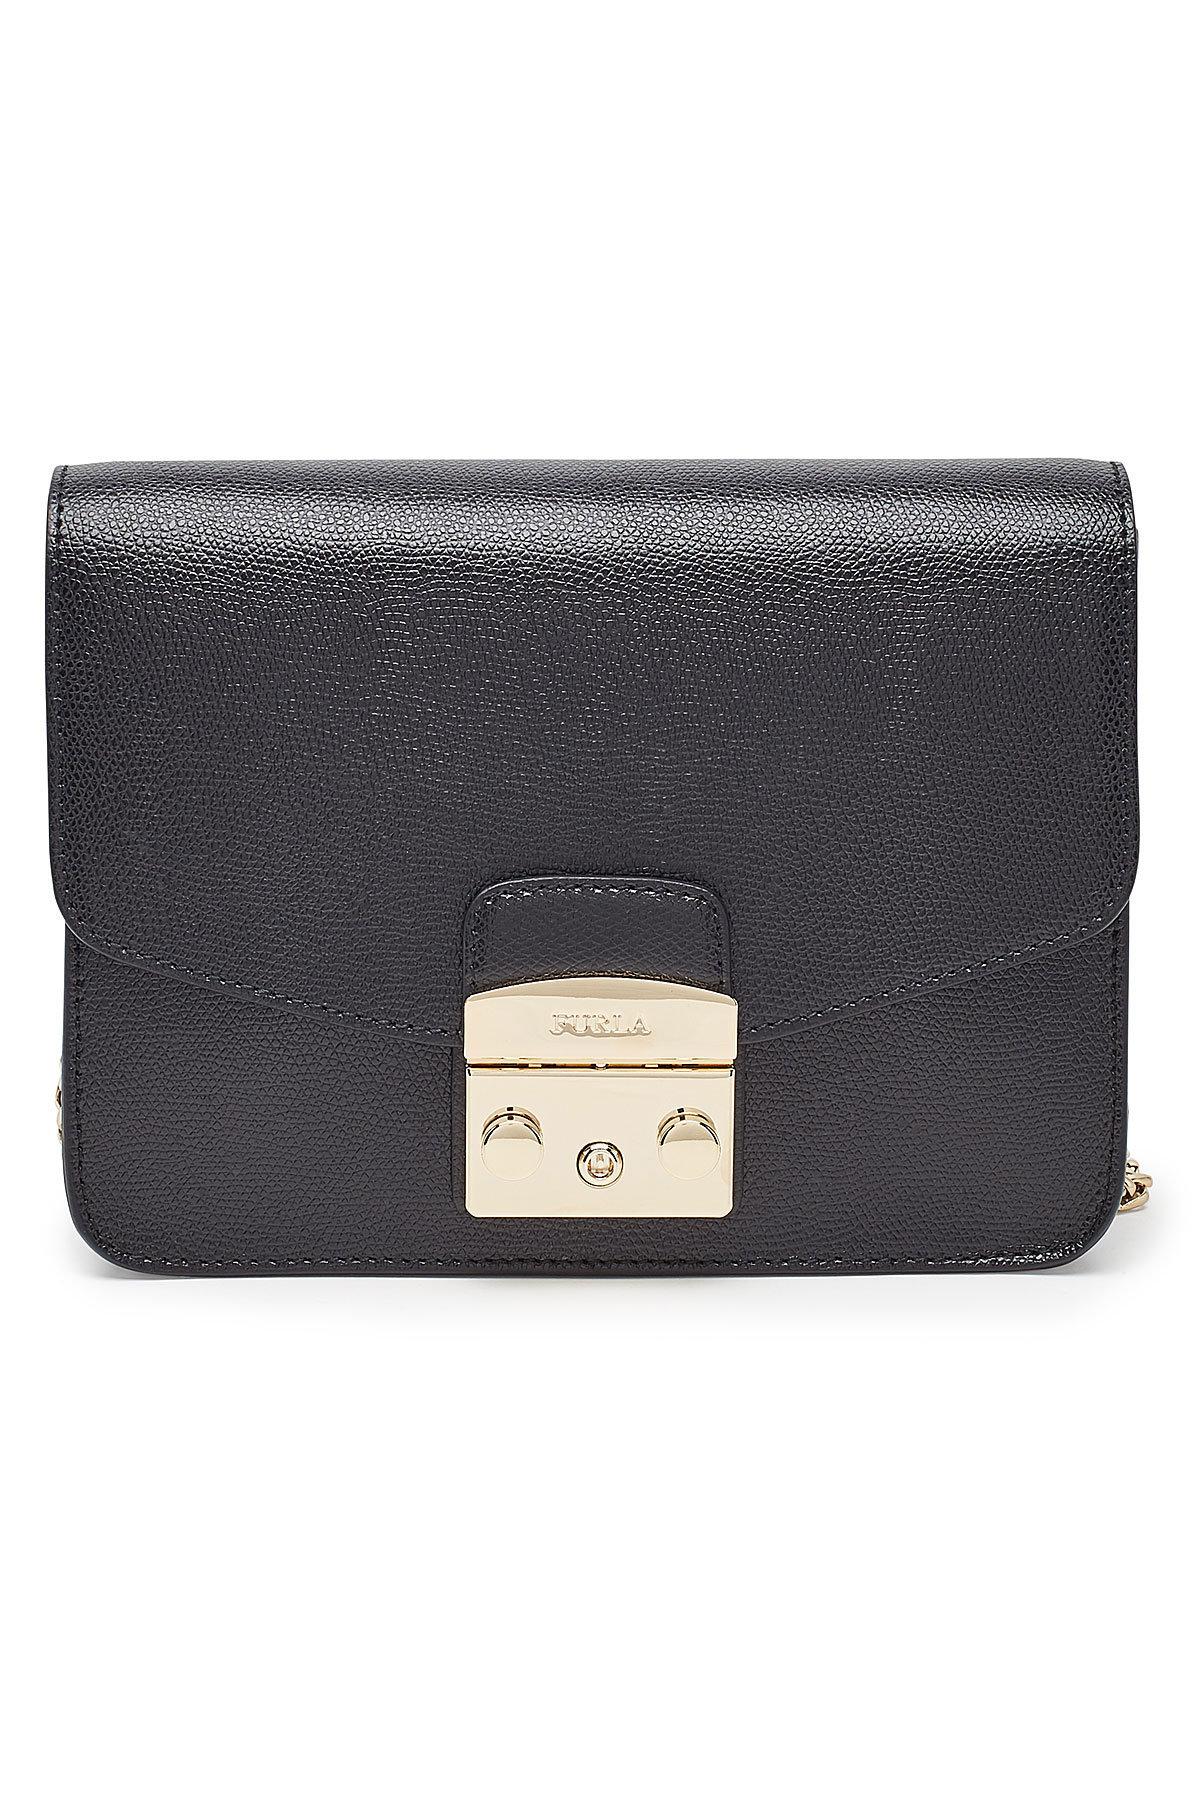 Furla Metropolis S Leather Crossbody Bag In Black